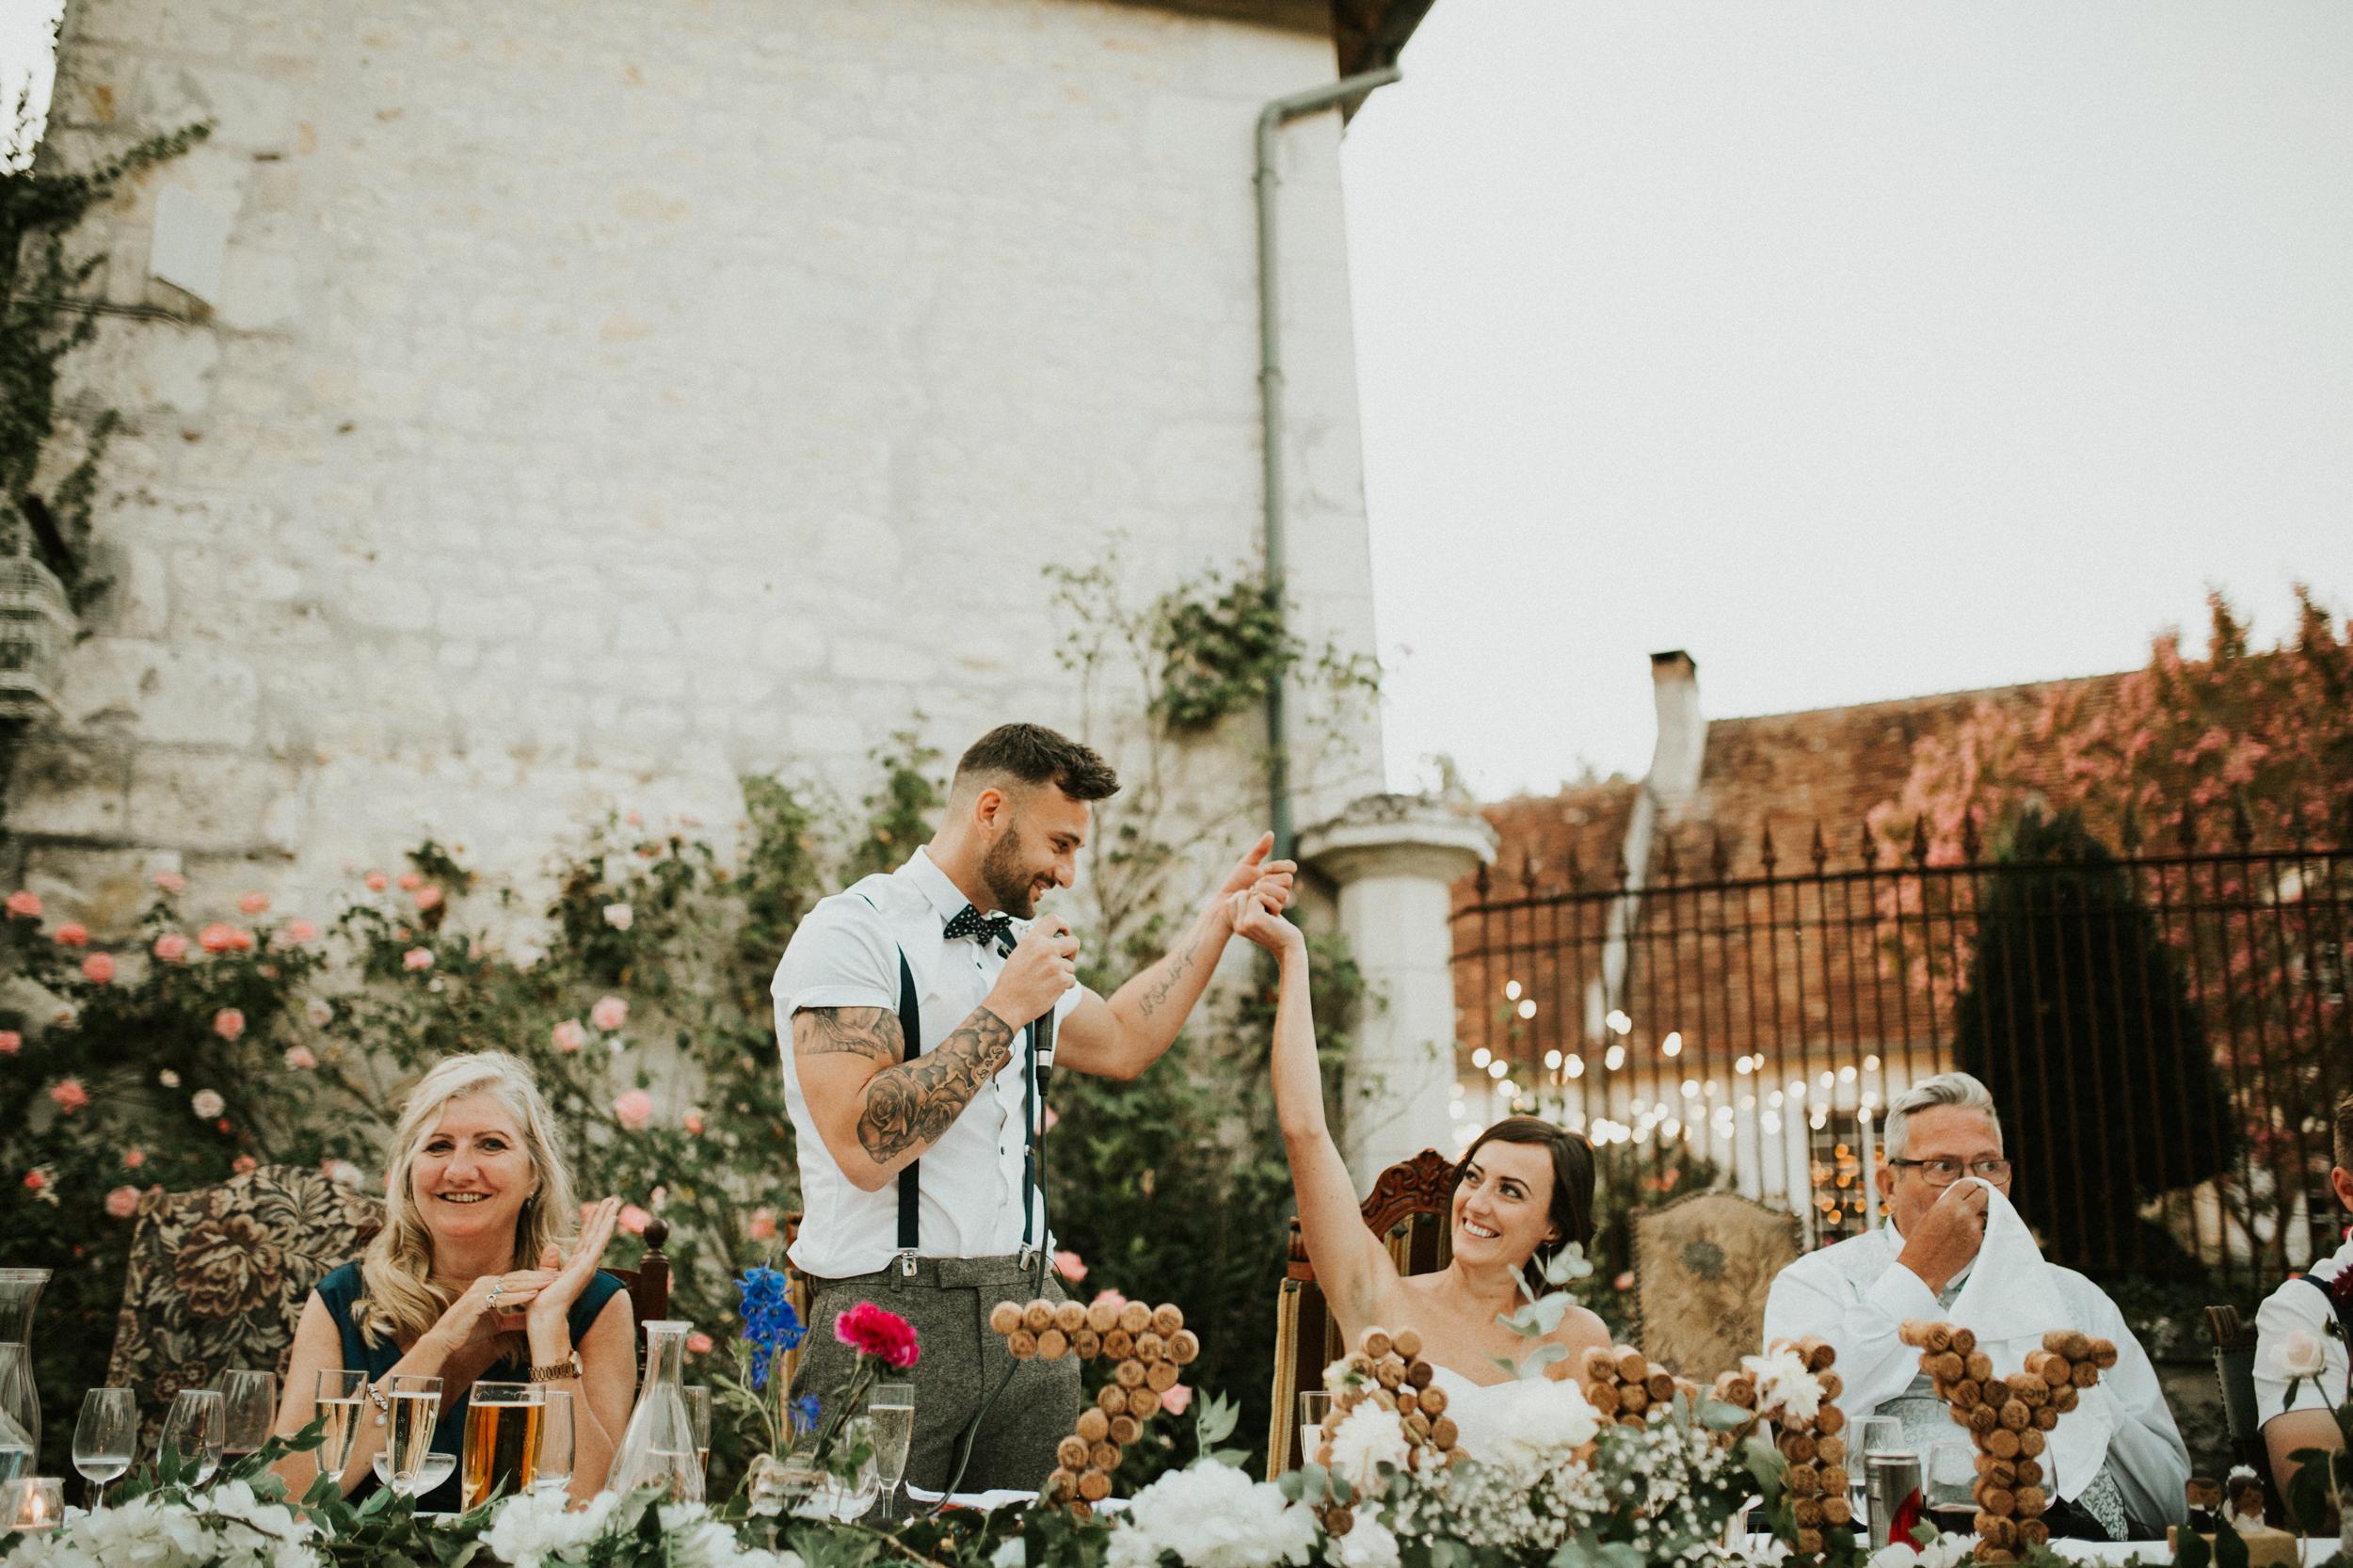 Amy-Zac-Destination-Wedding-France-Manoir-Foulquetiere-Darina-Stoda-Photography-100.jpg